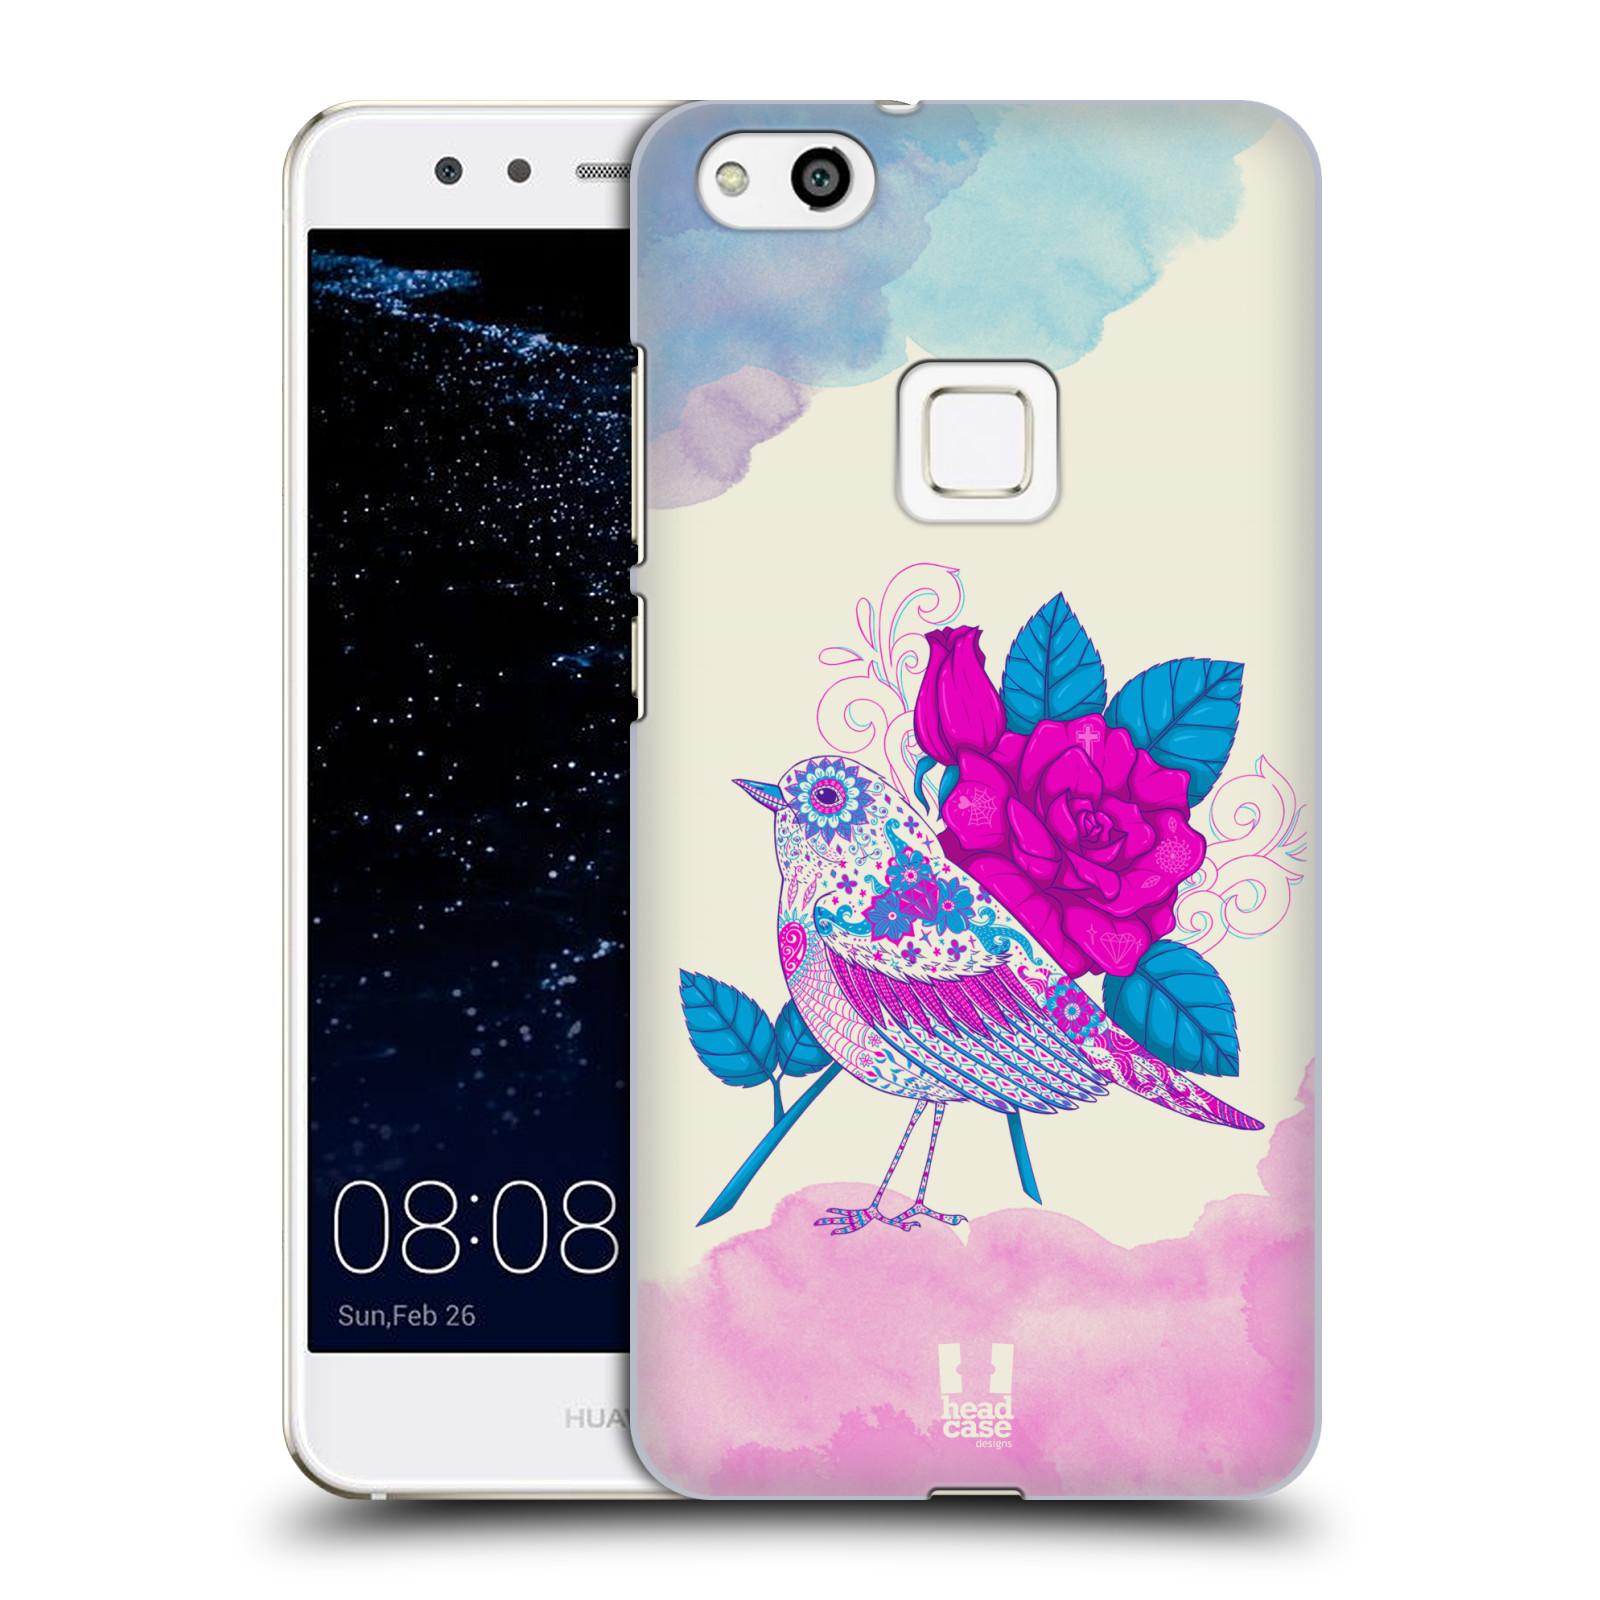 Plastové pouzdro na mobil Huawei P10 Lite Head Case - PTÁČEK FUCHSIA (Plastový kryt či obal na mobilní telefon Huawei P10 Lite Dual SIM (LX1/LX1A))